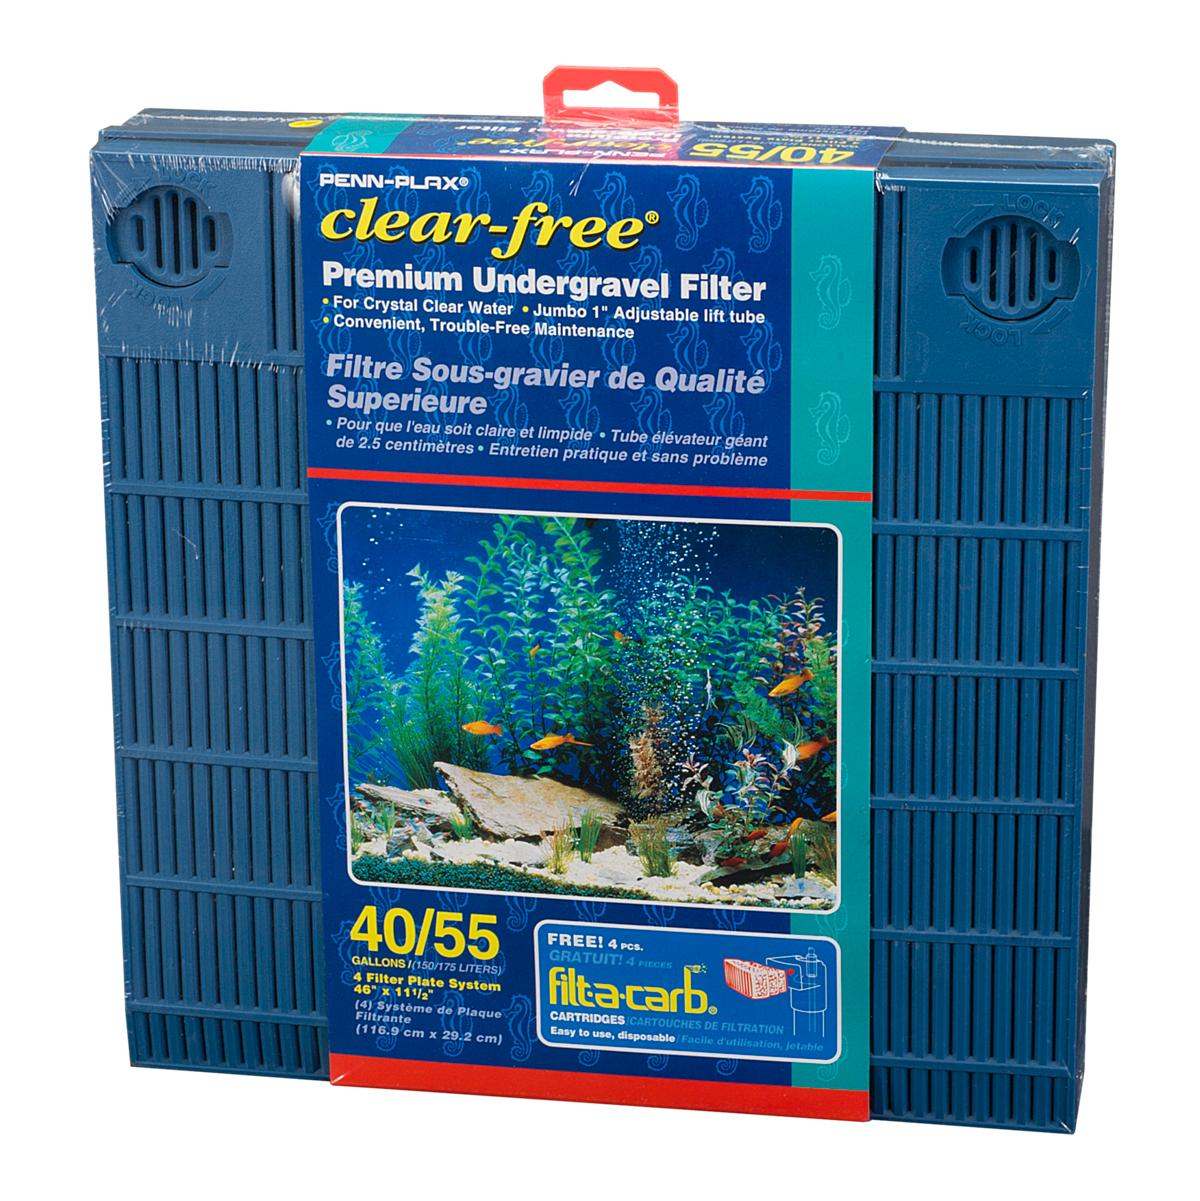 Amazon.com : Penn Plax Premium Under Gravel Filter System - for 40-55 Gallon Fish Tanks